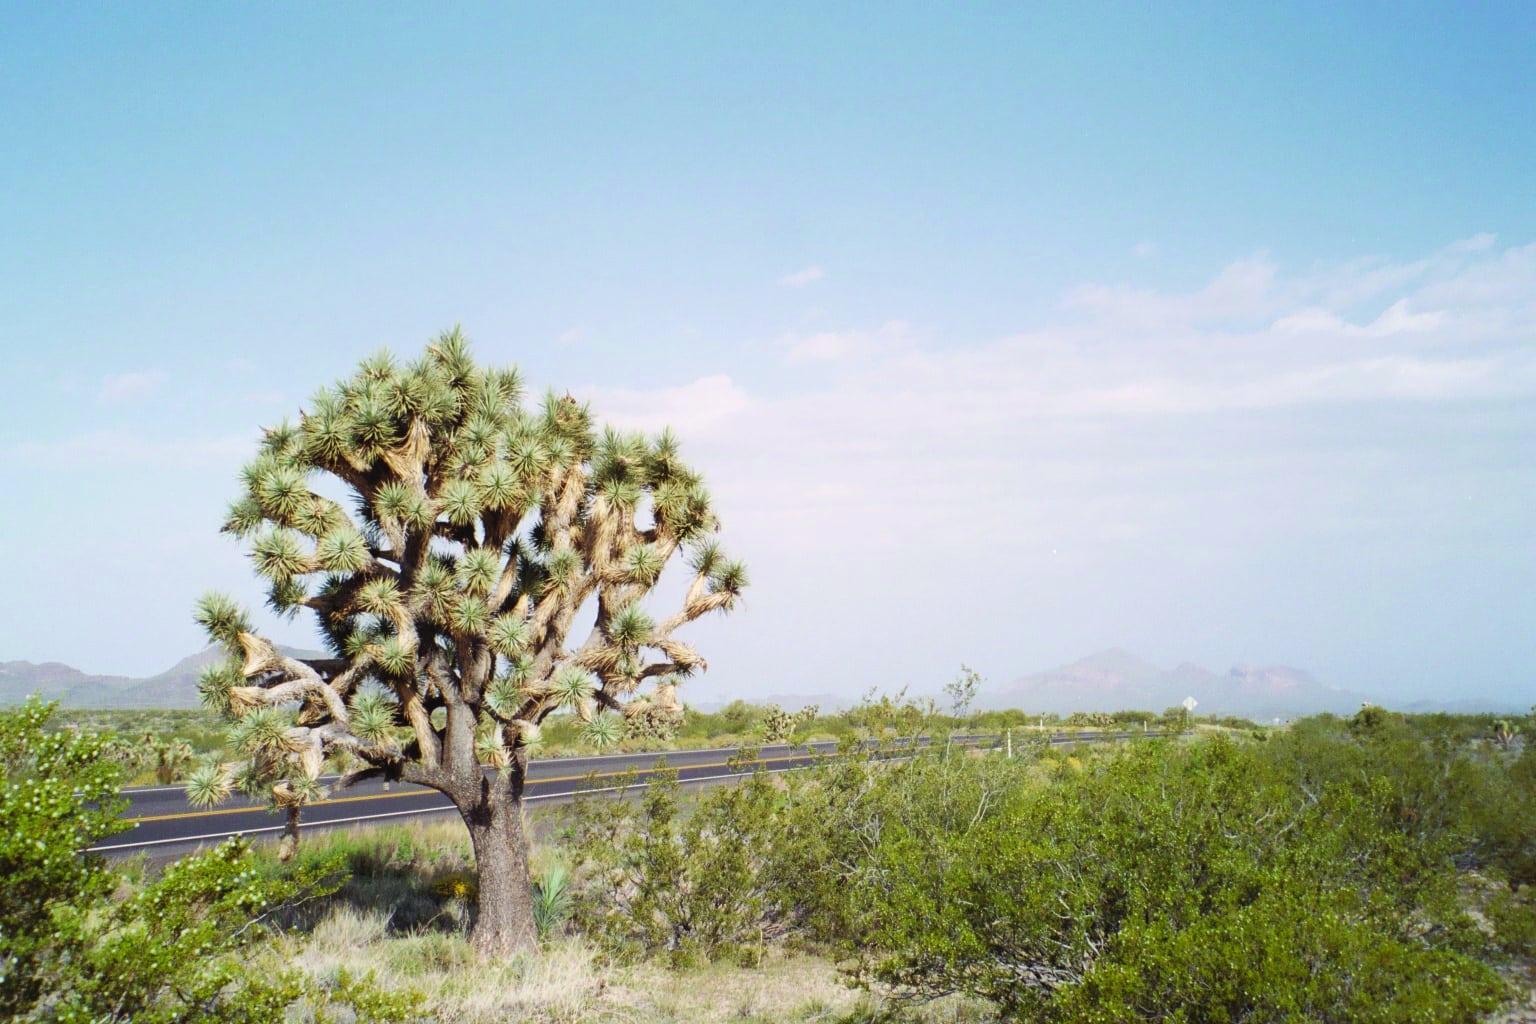 Joshua Tree Forest Parkway in Arizona